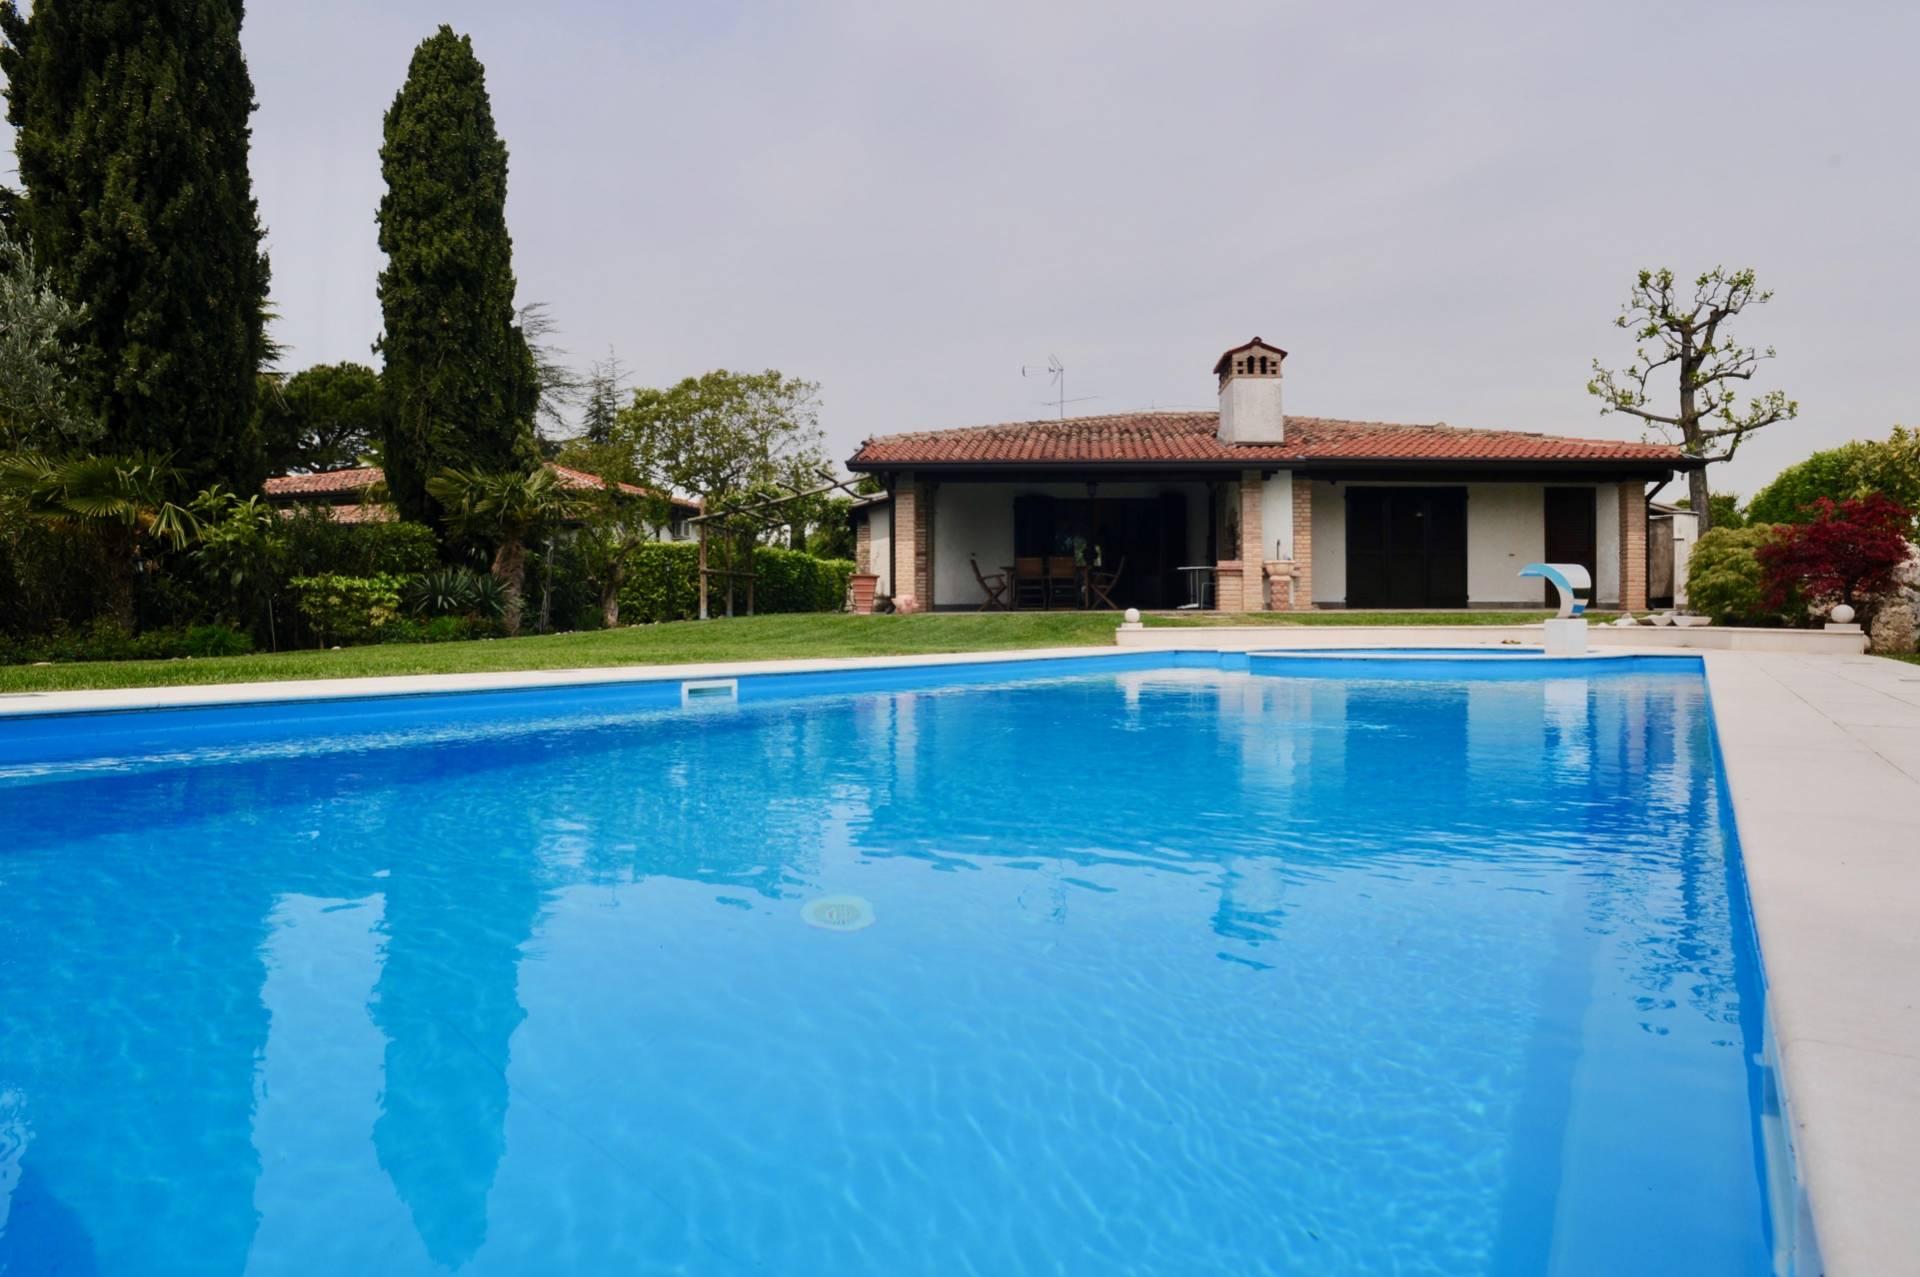 Villa in Vendita a Padenghe Sul Garda: 3 locali, 100 mq - Foto 16